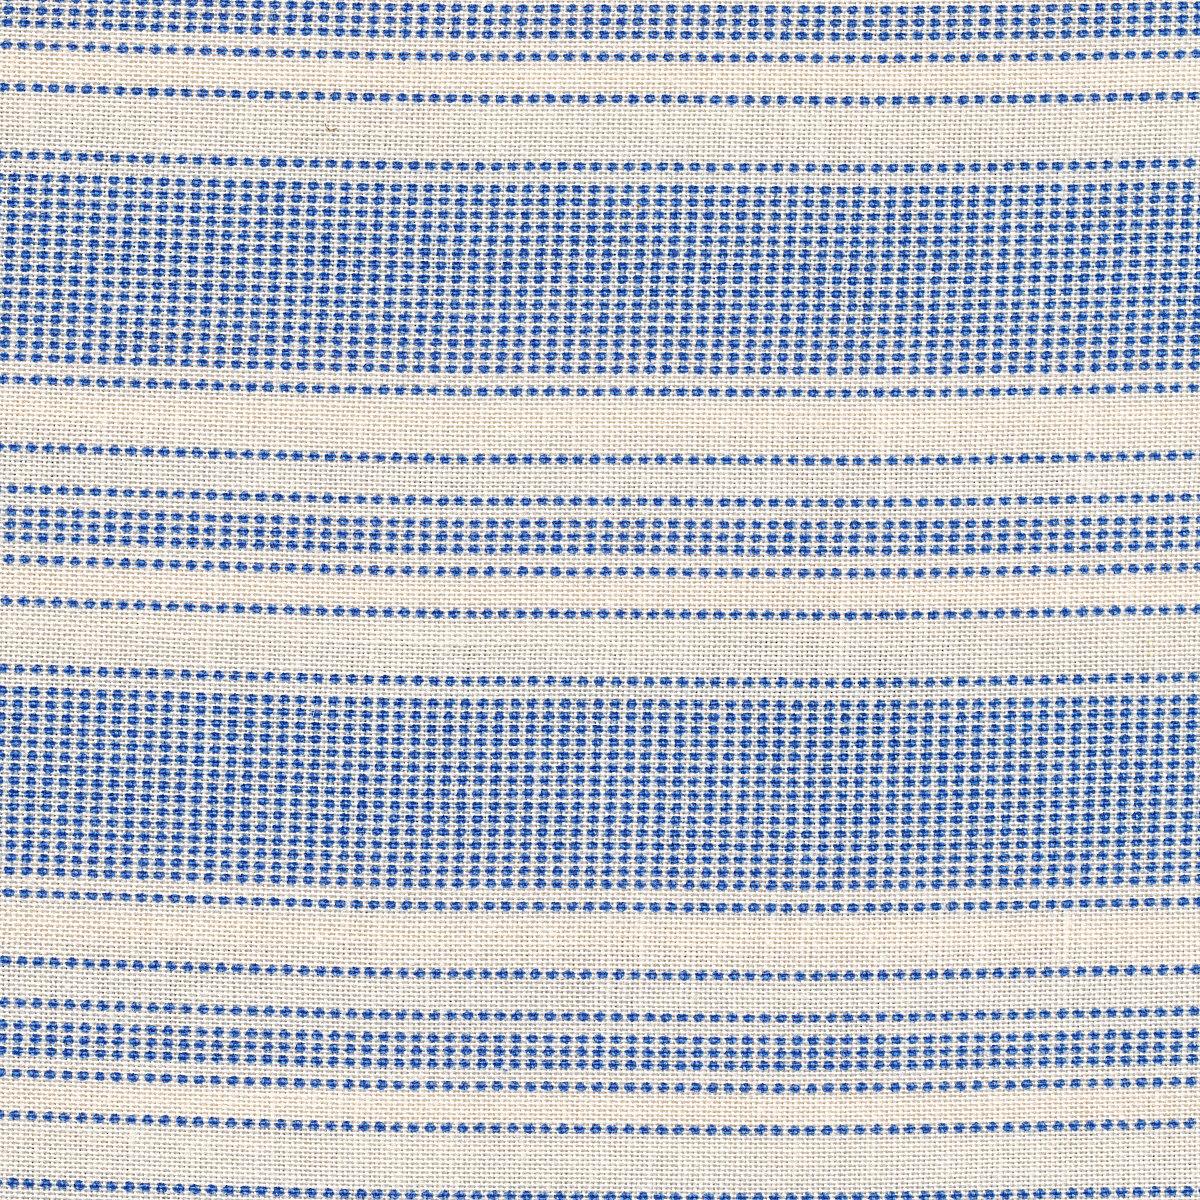 Tea Towel - Biscuit Stripes Blue - 130061